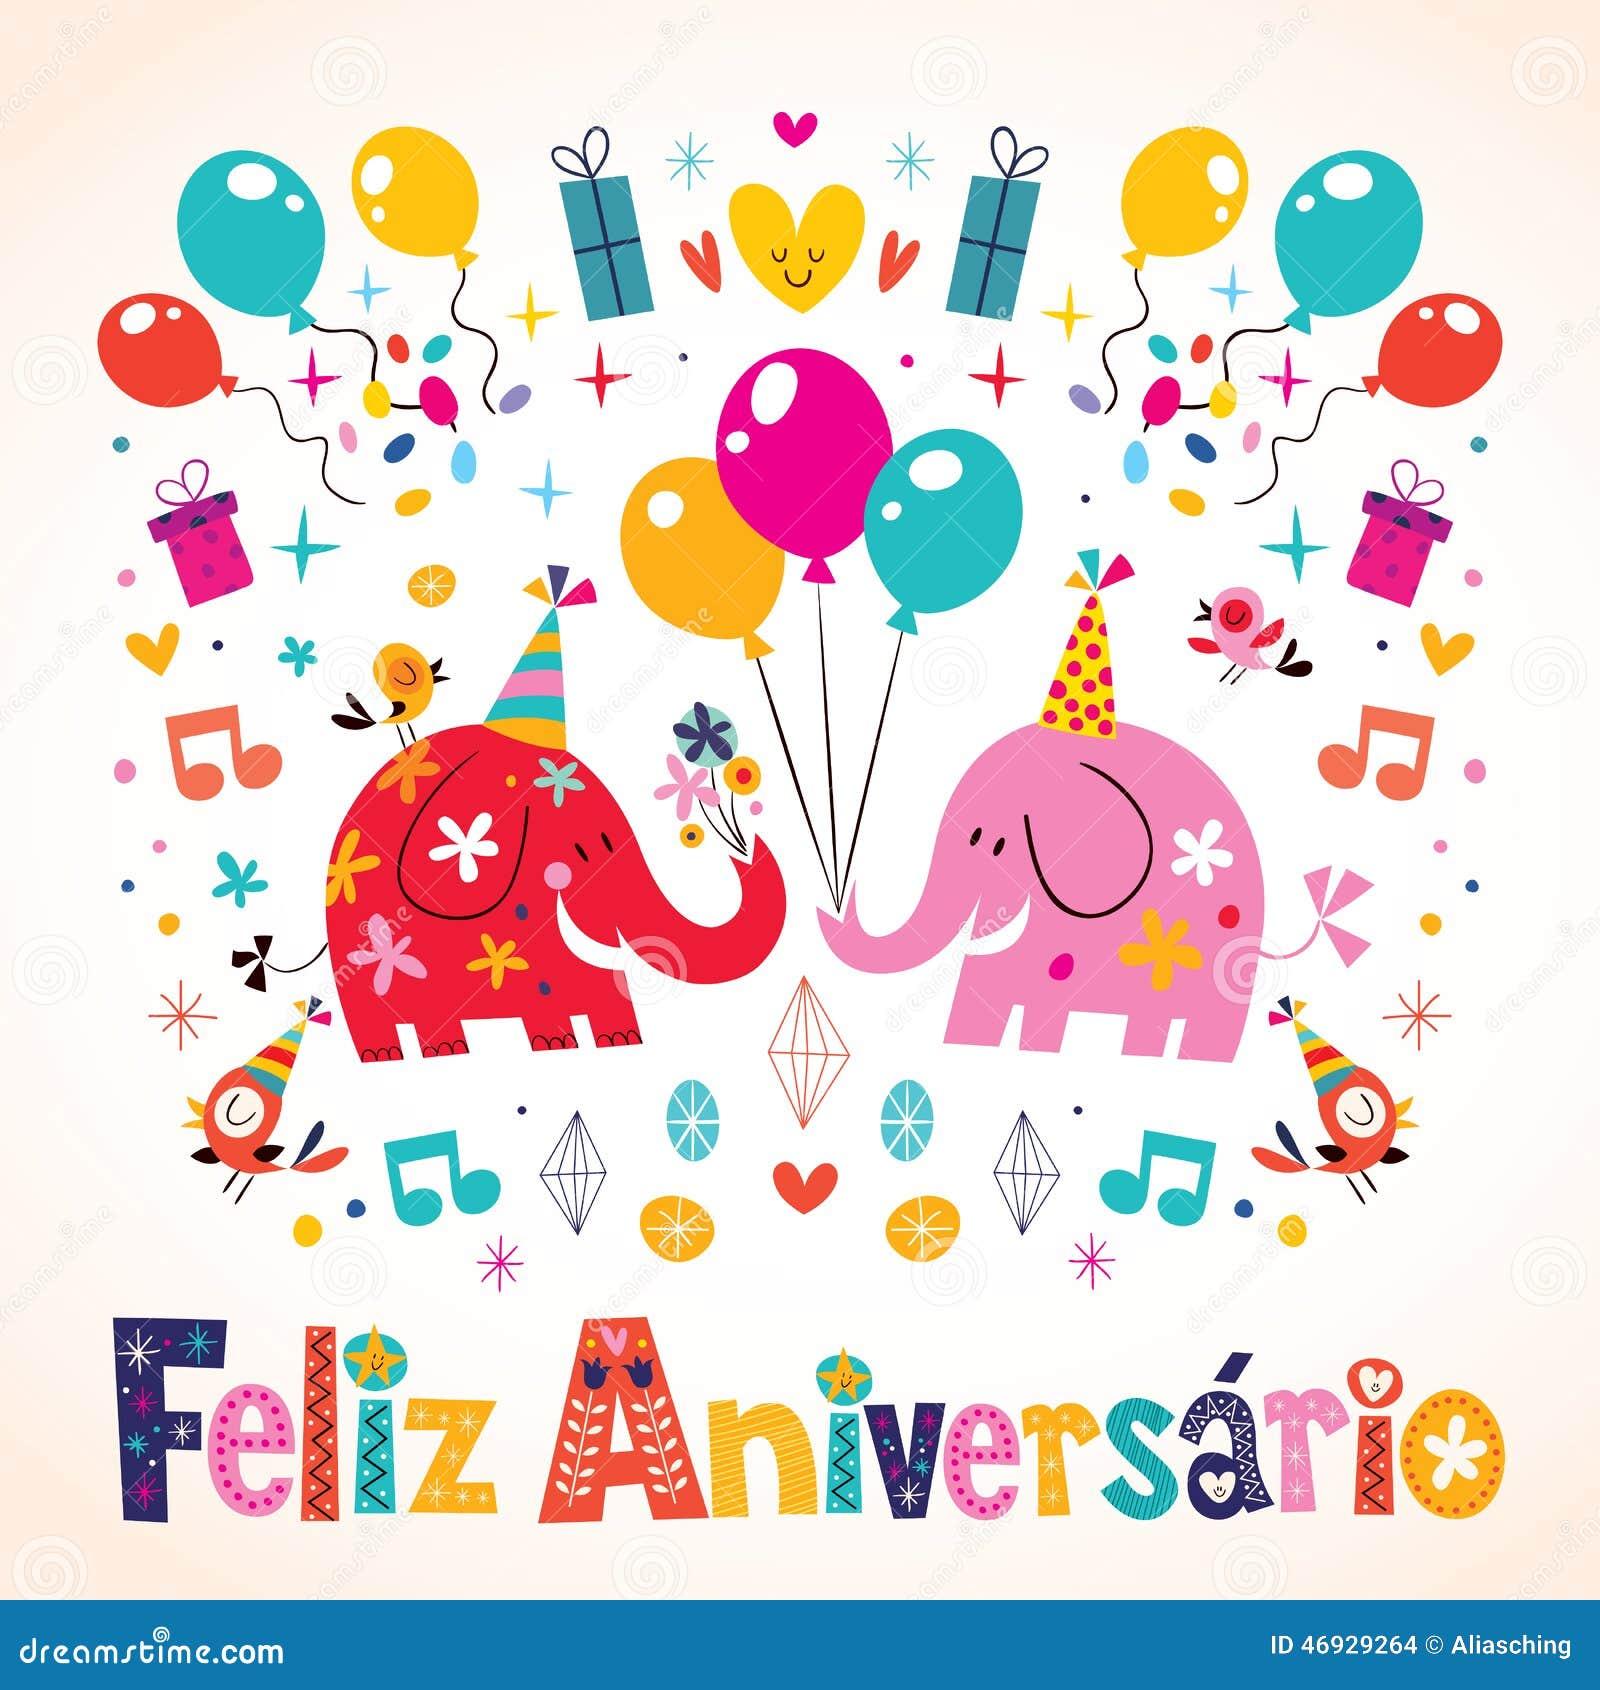 feliz aniversario portuguese happy birthday card stock credit card clip art png credit card clip art png